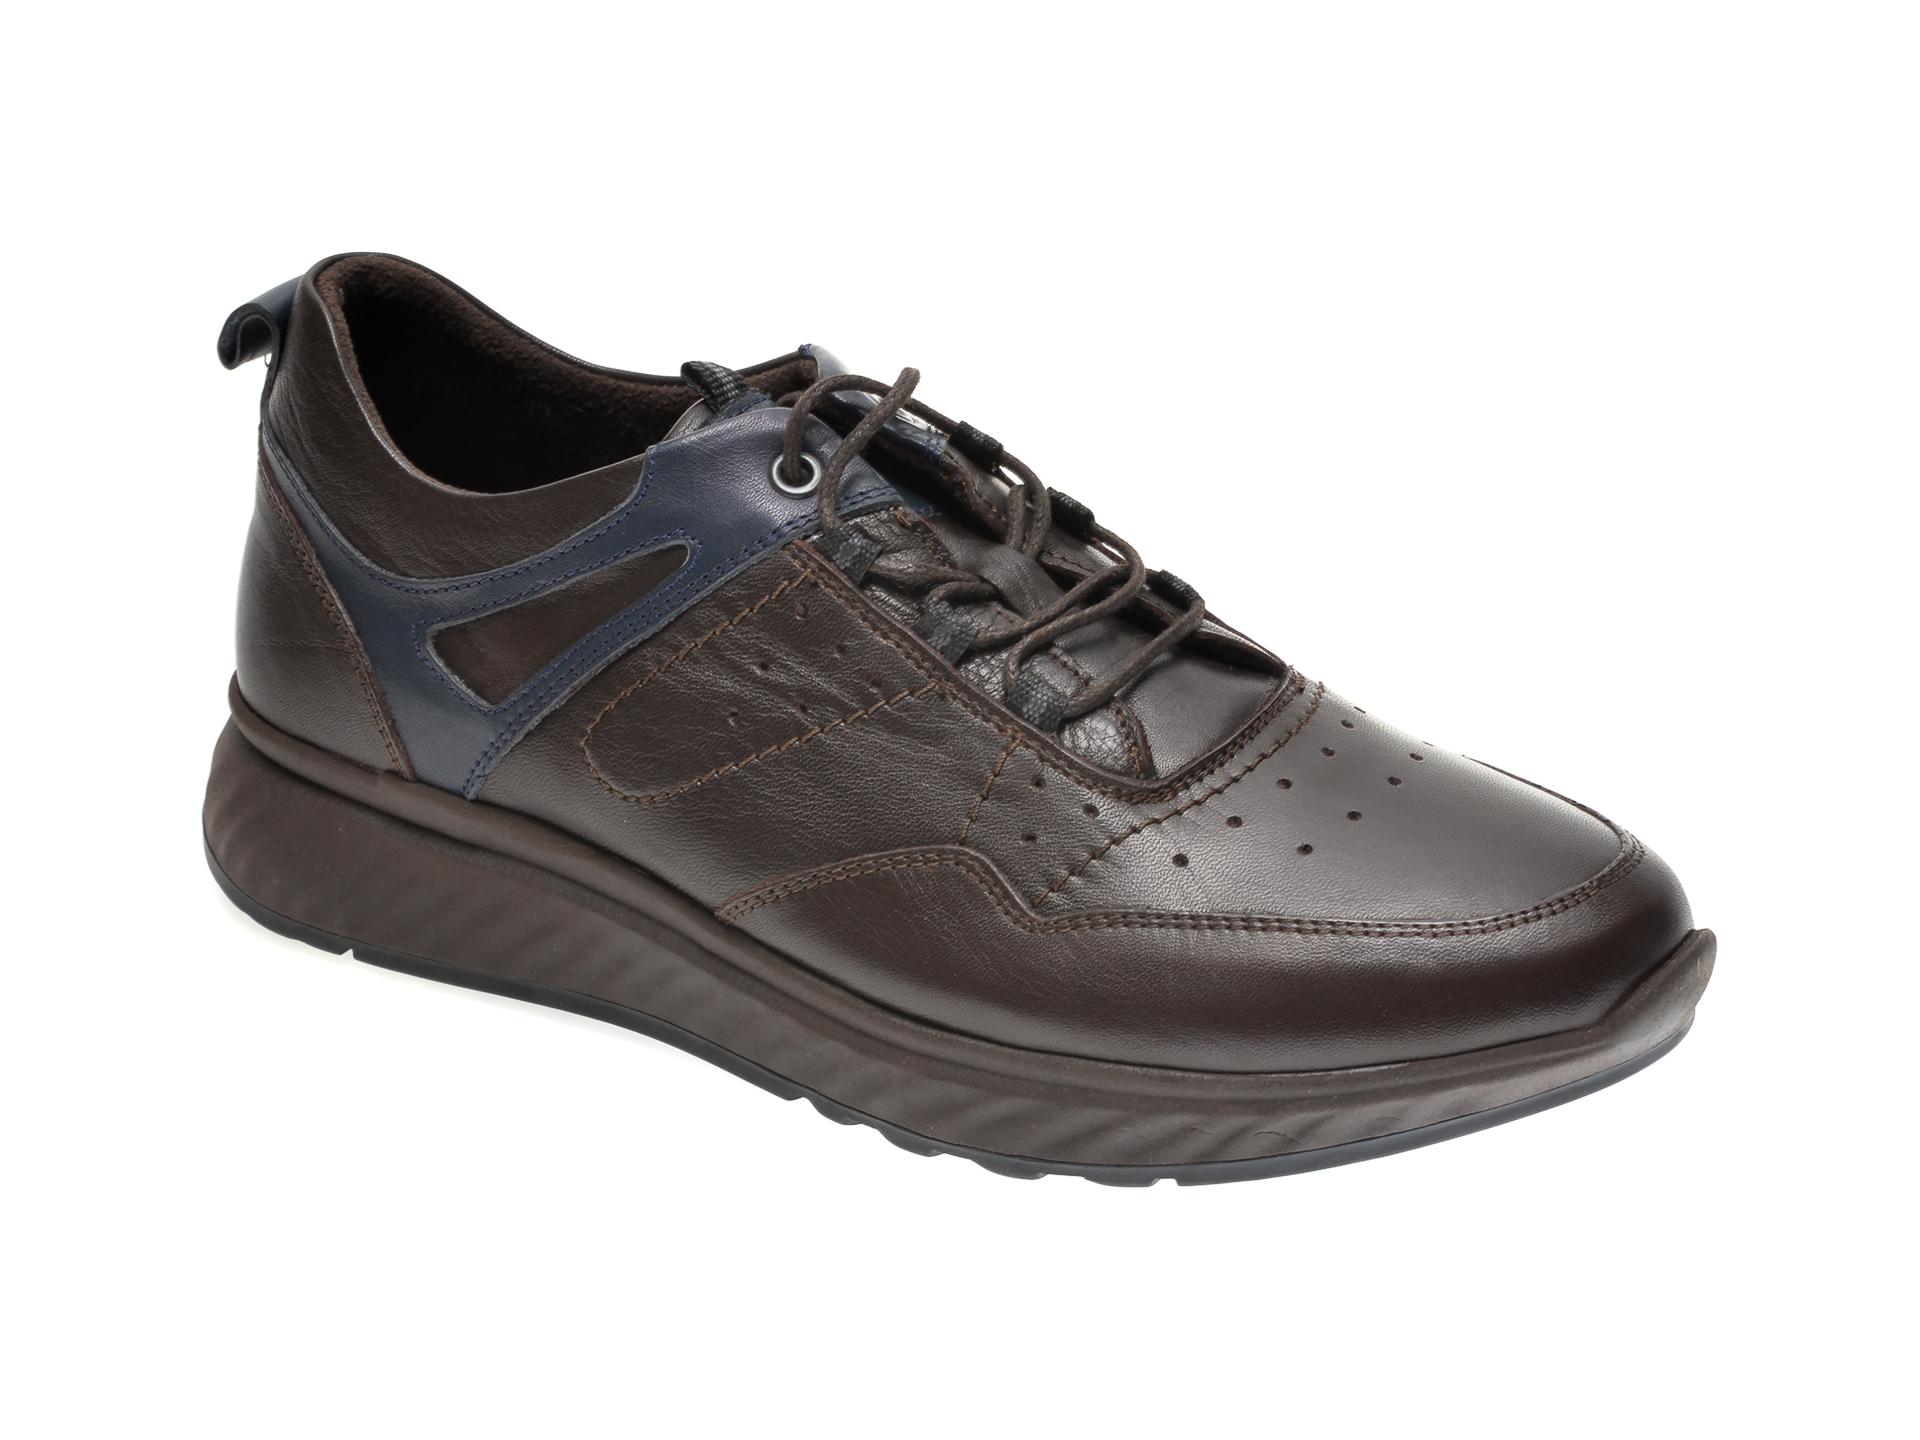 Pantofi OTTER maro, 411, din piele naturala